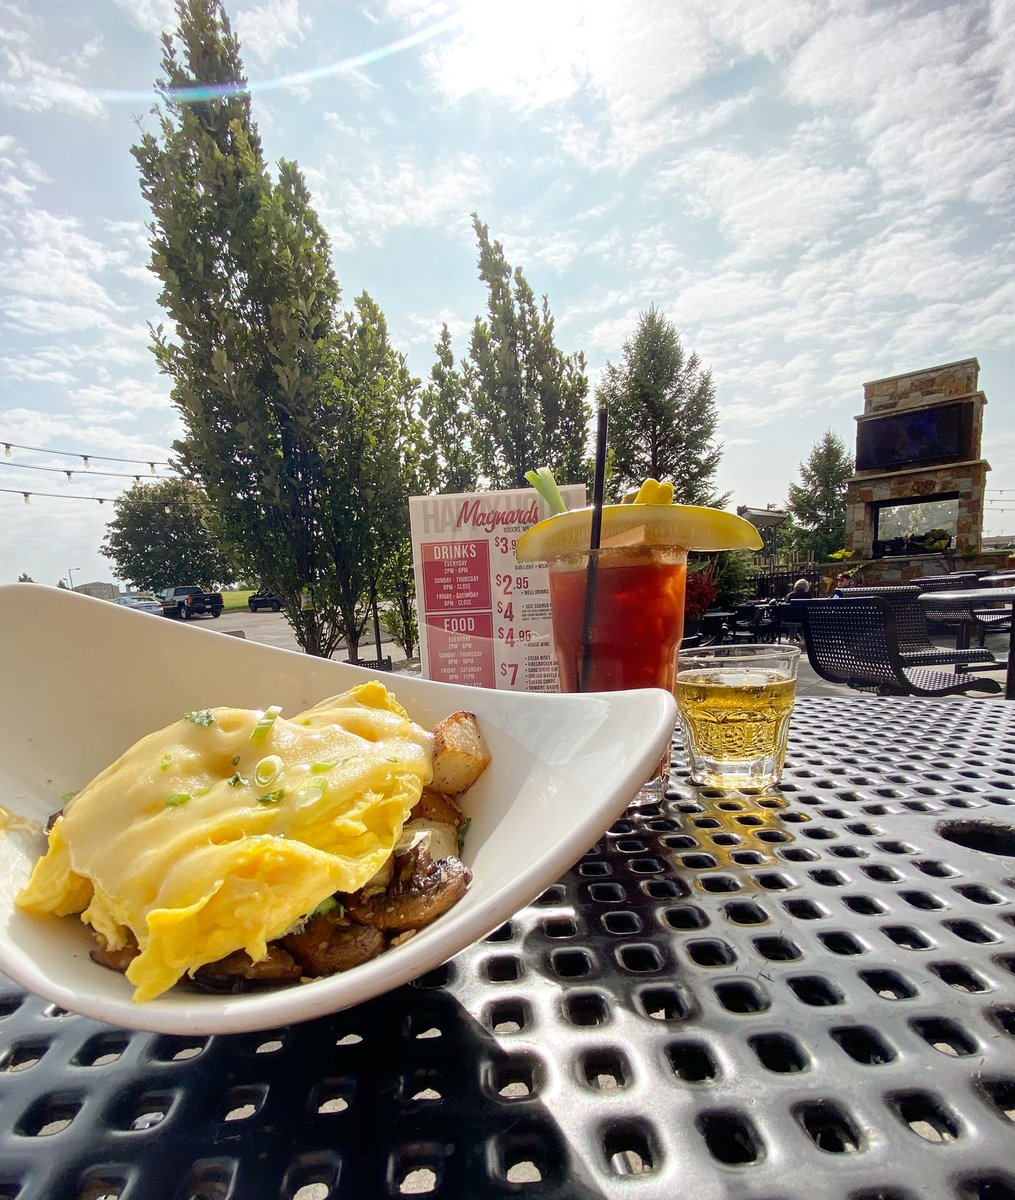 Holding onto those last few beautiful days of summer.  ☀️☀️☀️ Today's breakfast special is a Mushroom and Swiss Skillet! • • • #MaynardsRogers #BreakfastSpecial #MushroomAndSwissSkillet #PatioSeason #LastDaysOfSummer #Minnesota #SaturdayVibes #BestBarInTown https://t.co/eshjFAM6vB